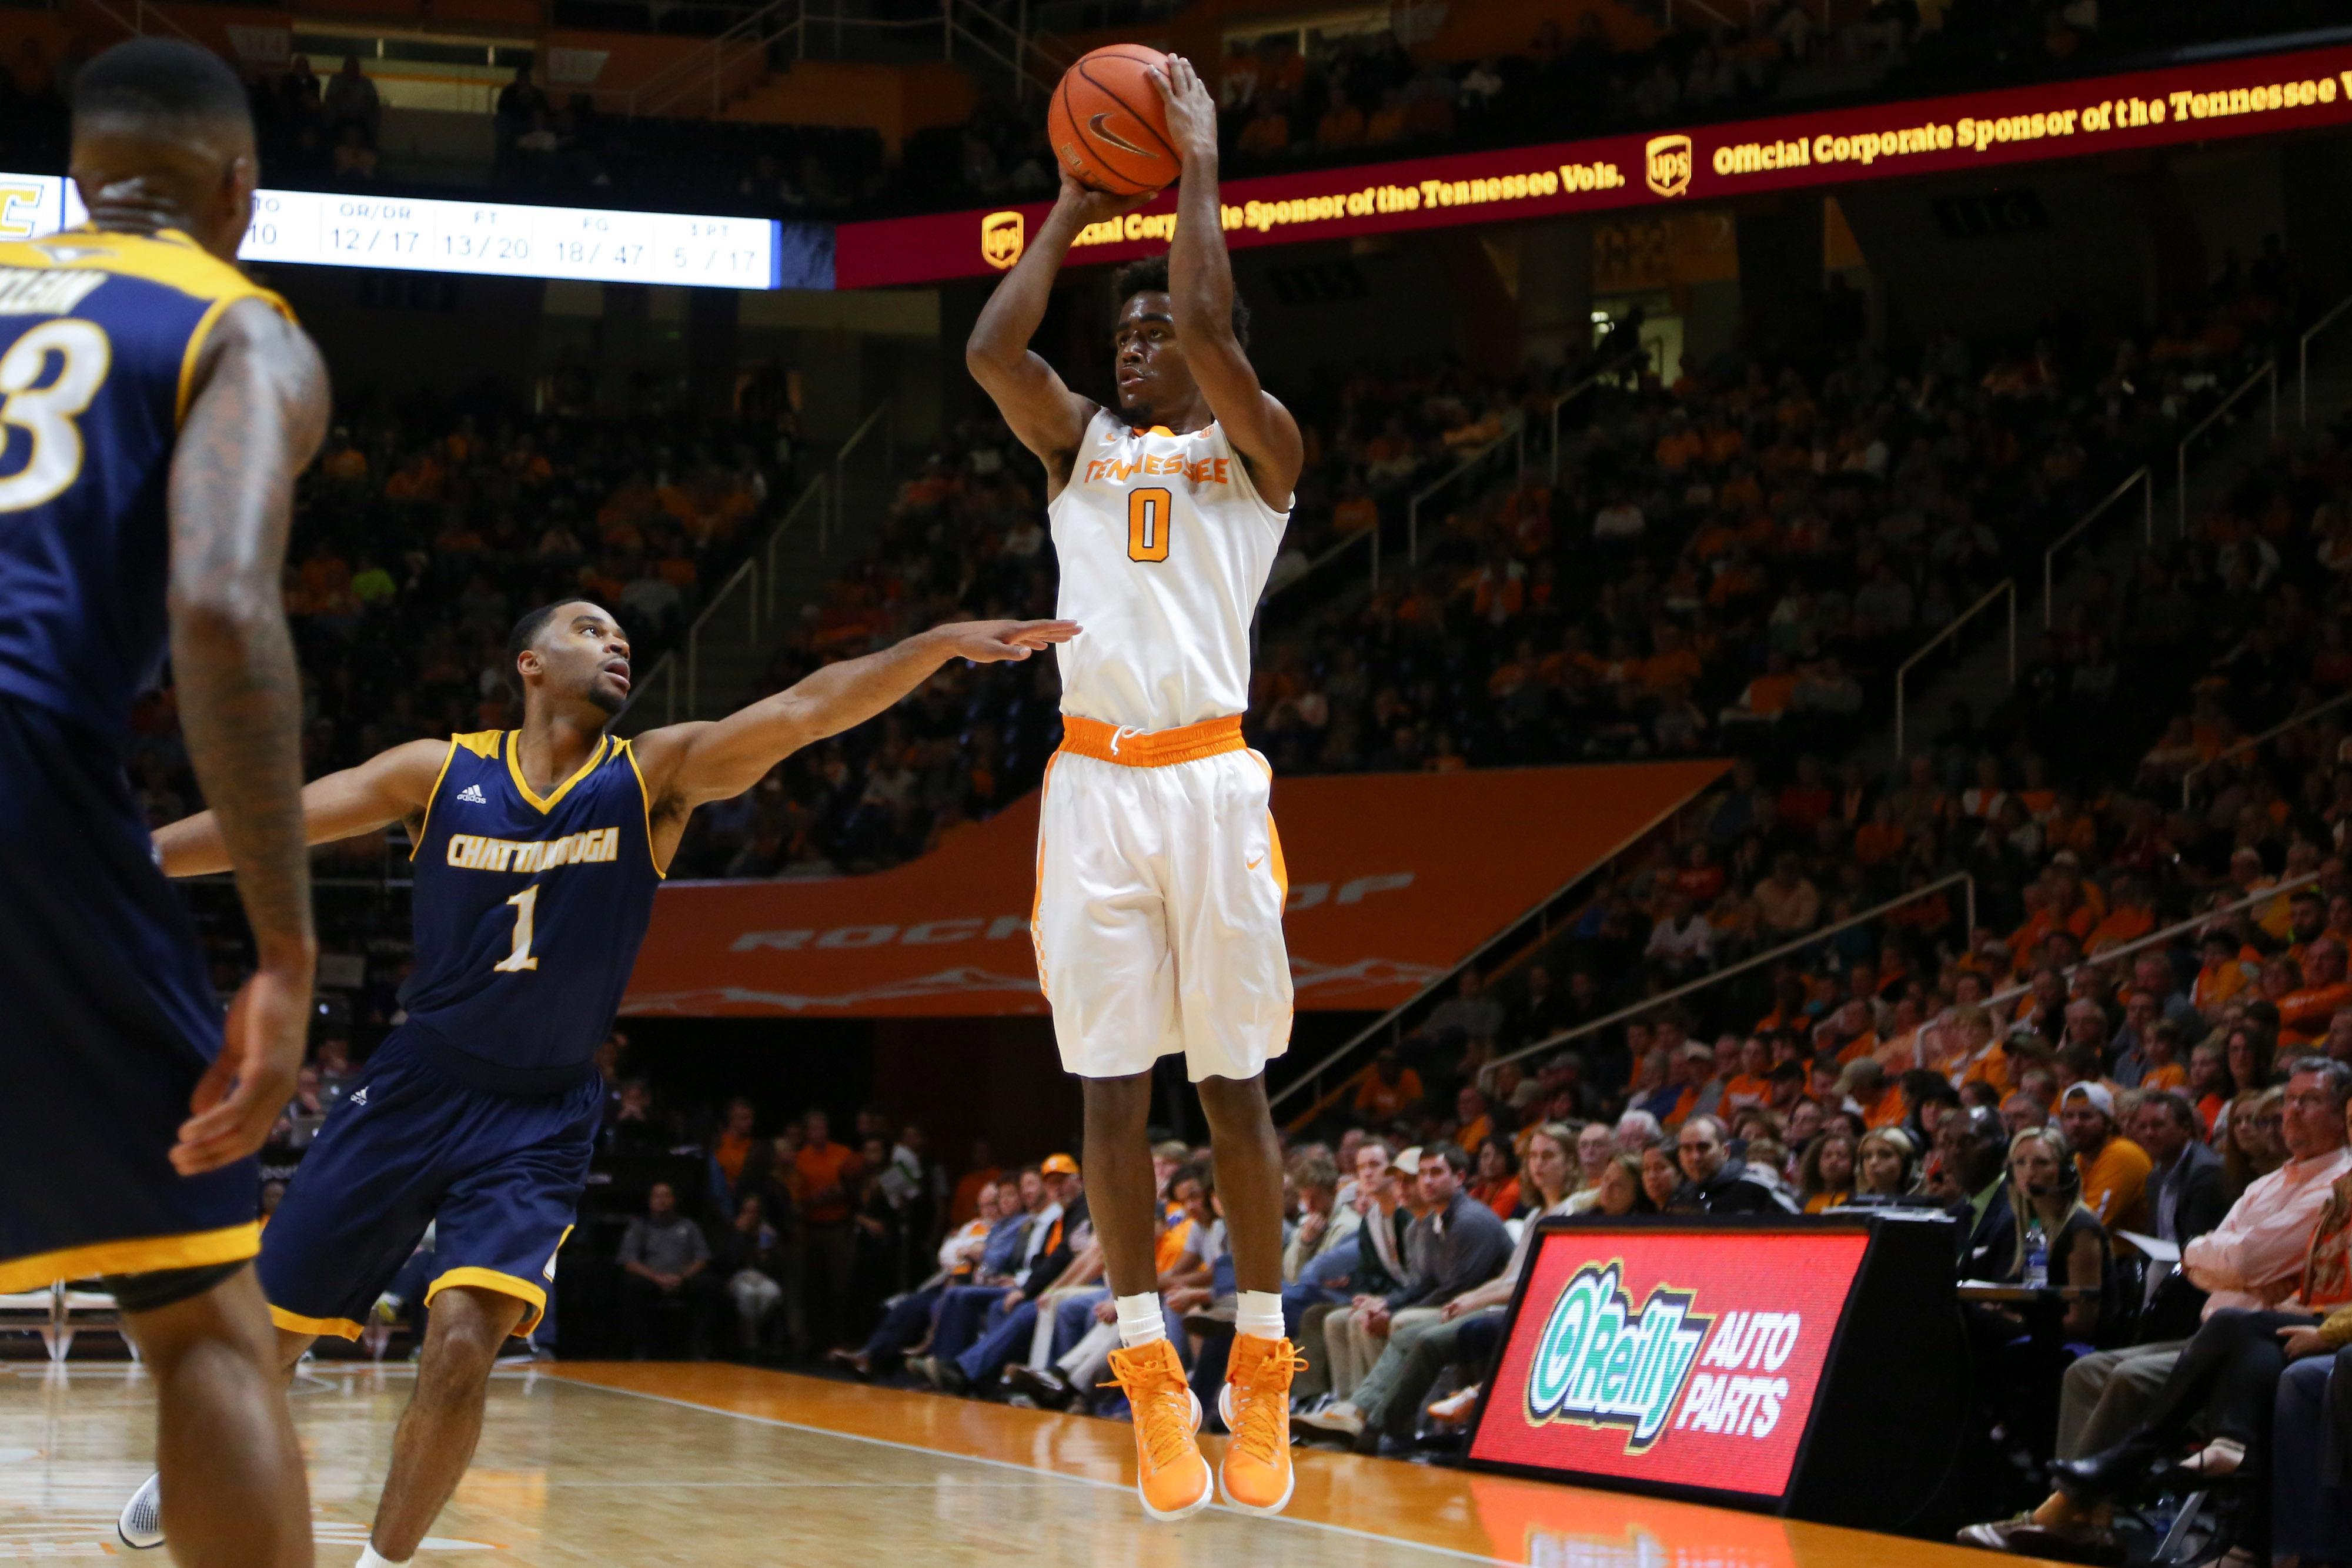 NCAA Basketball: Chattanooga at Tennessee